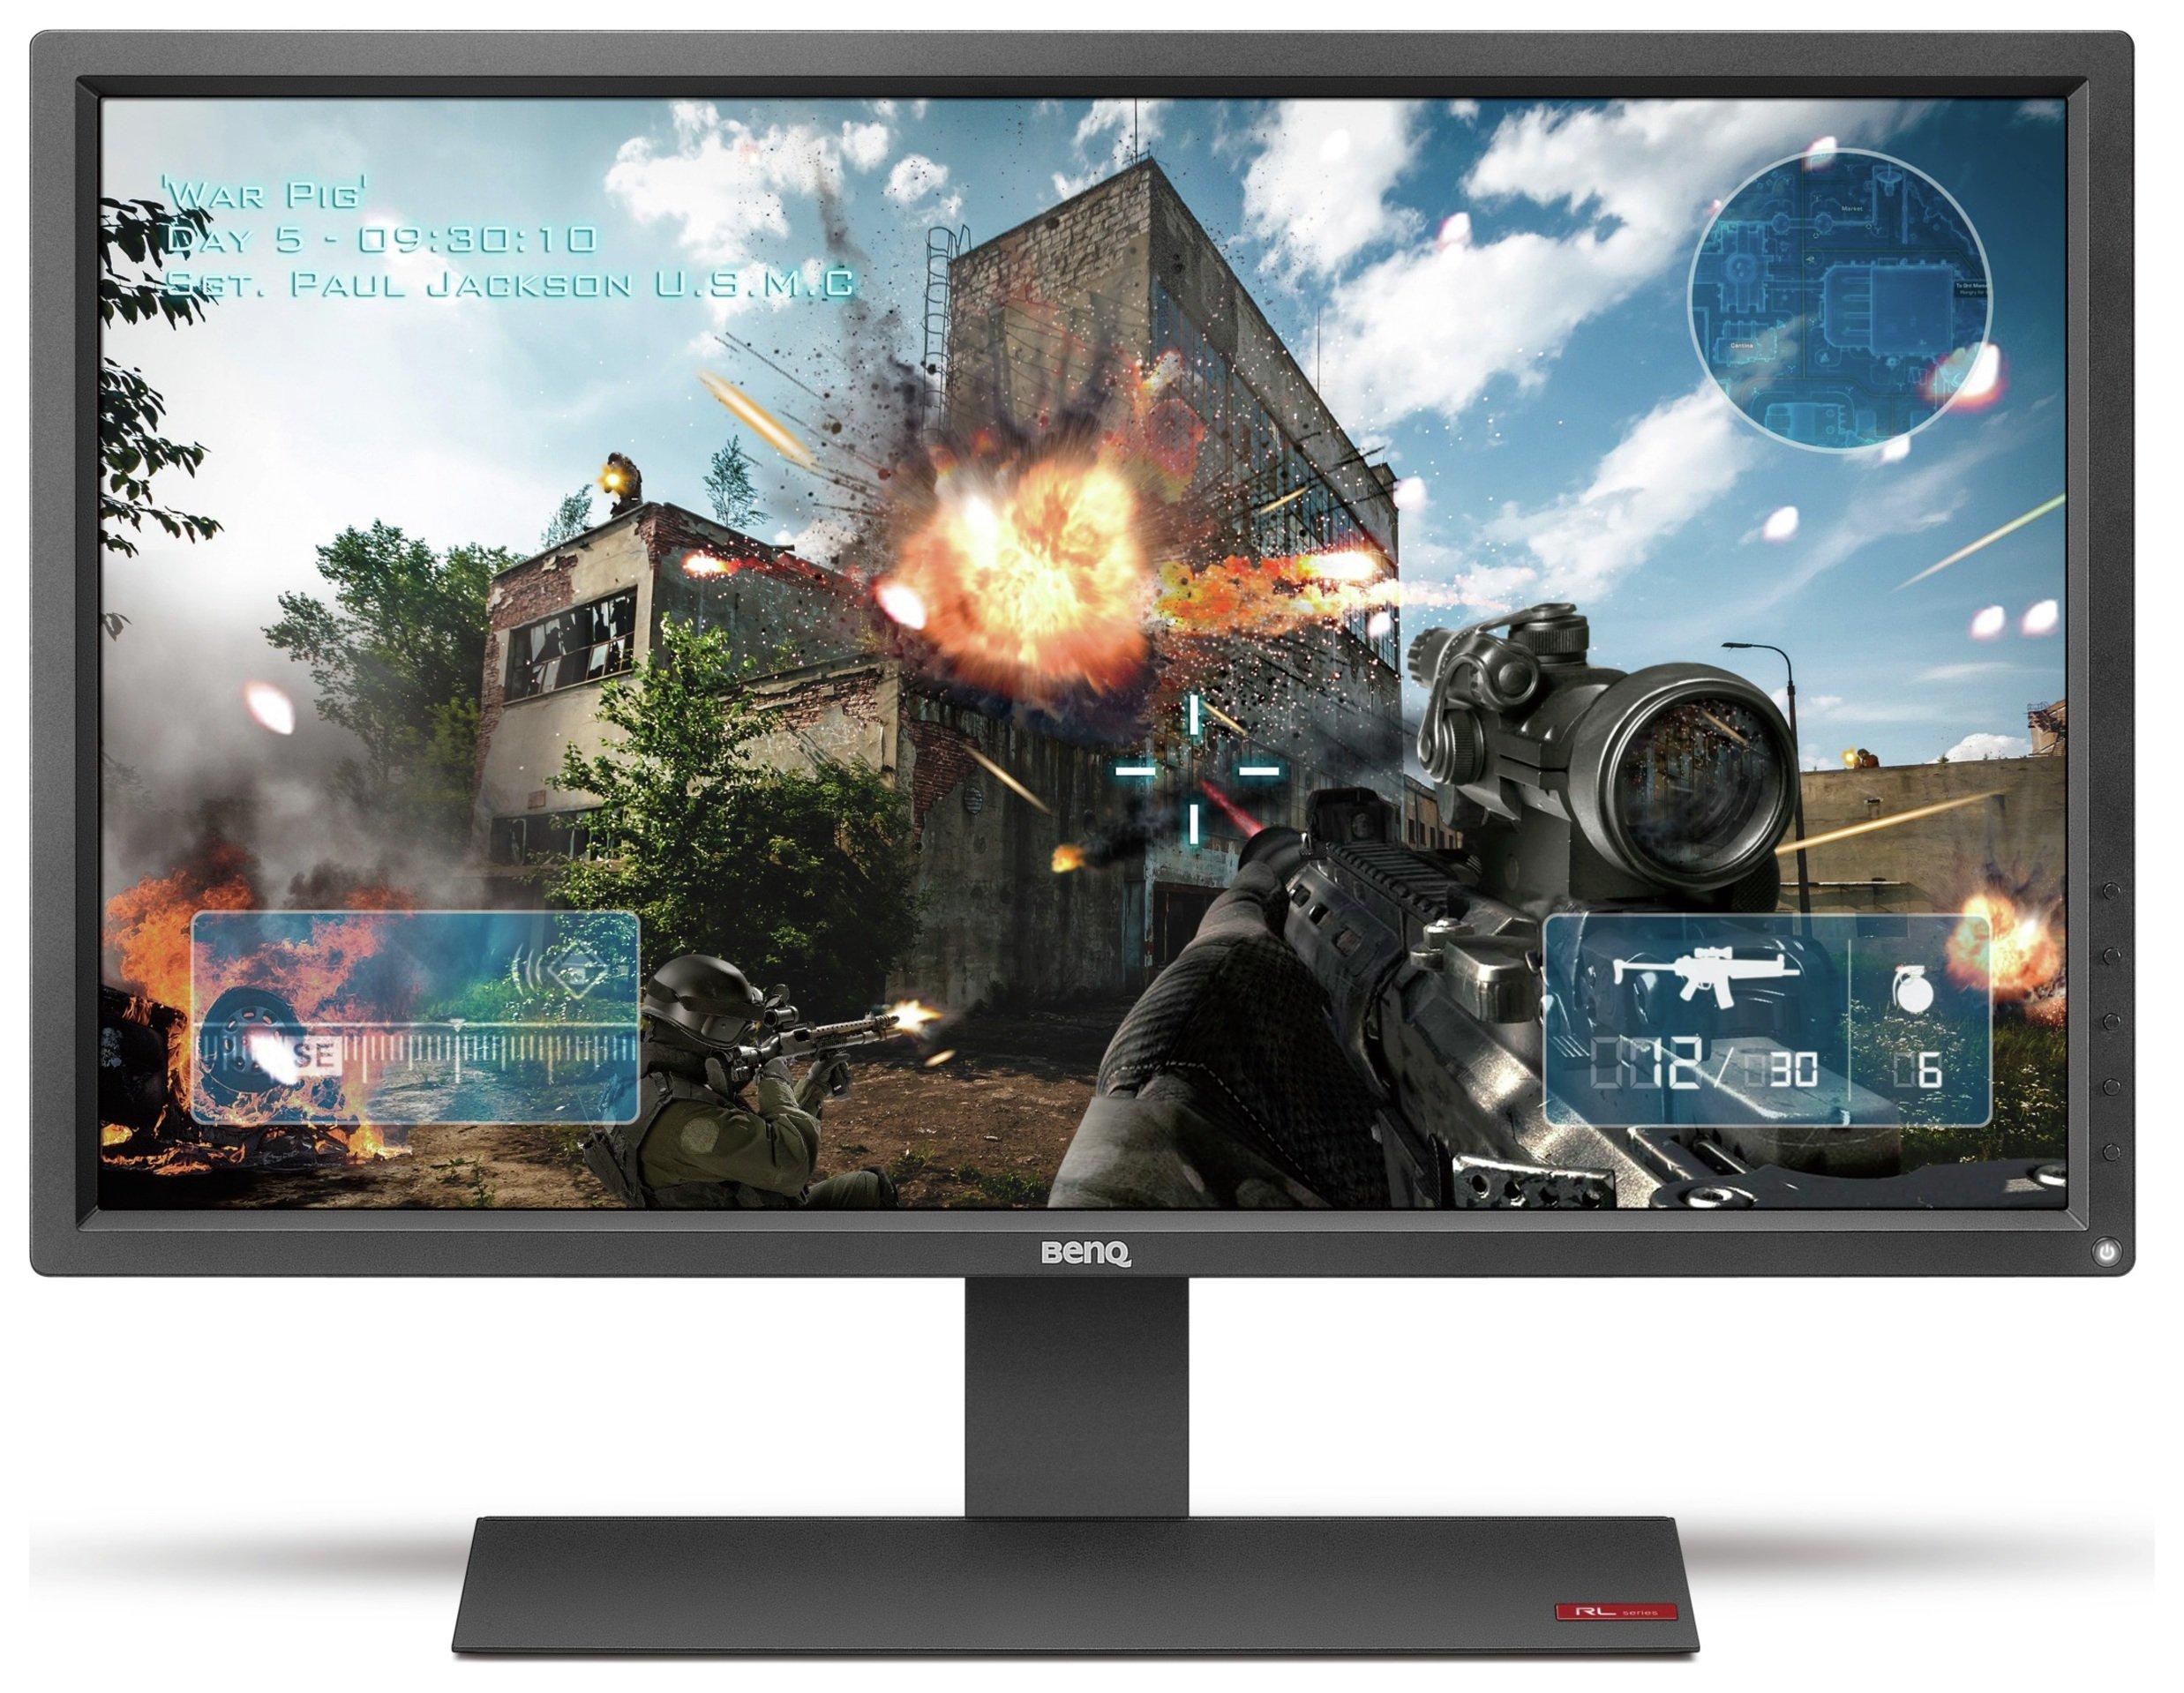 BenQ Zowie RL2755 27 Inch Gaming PC Monitor.